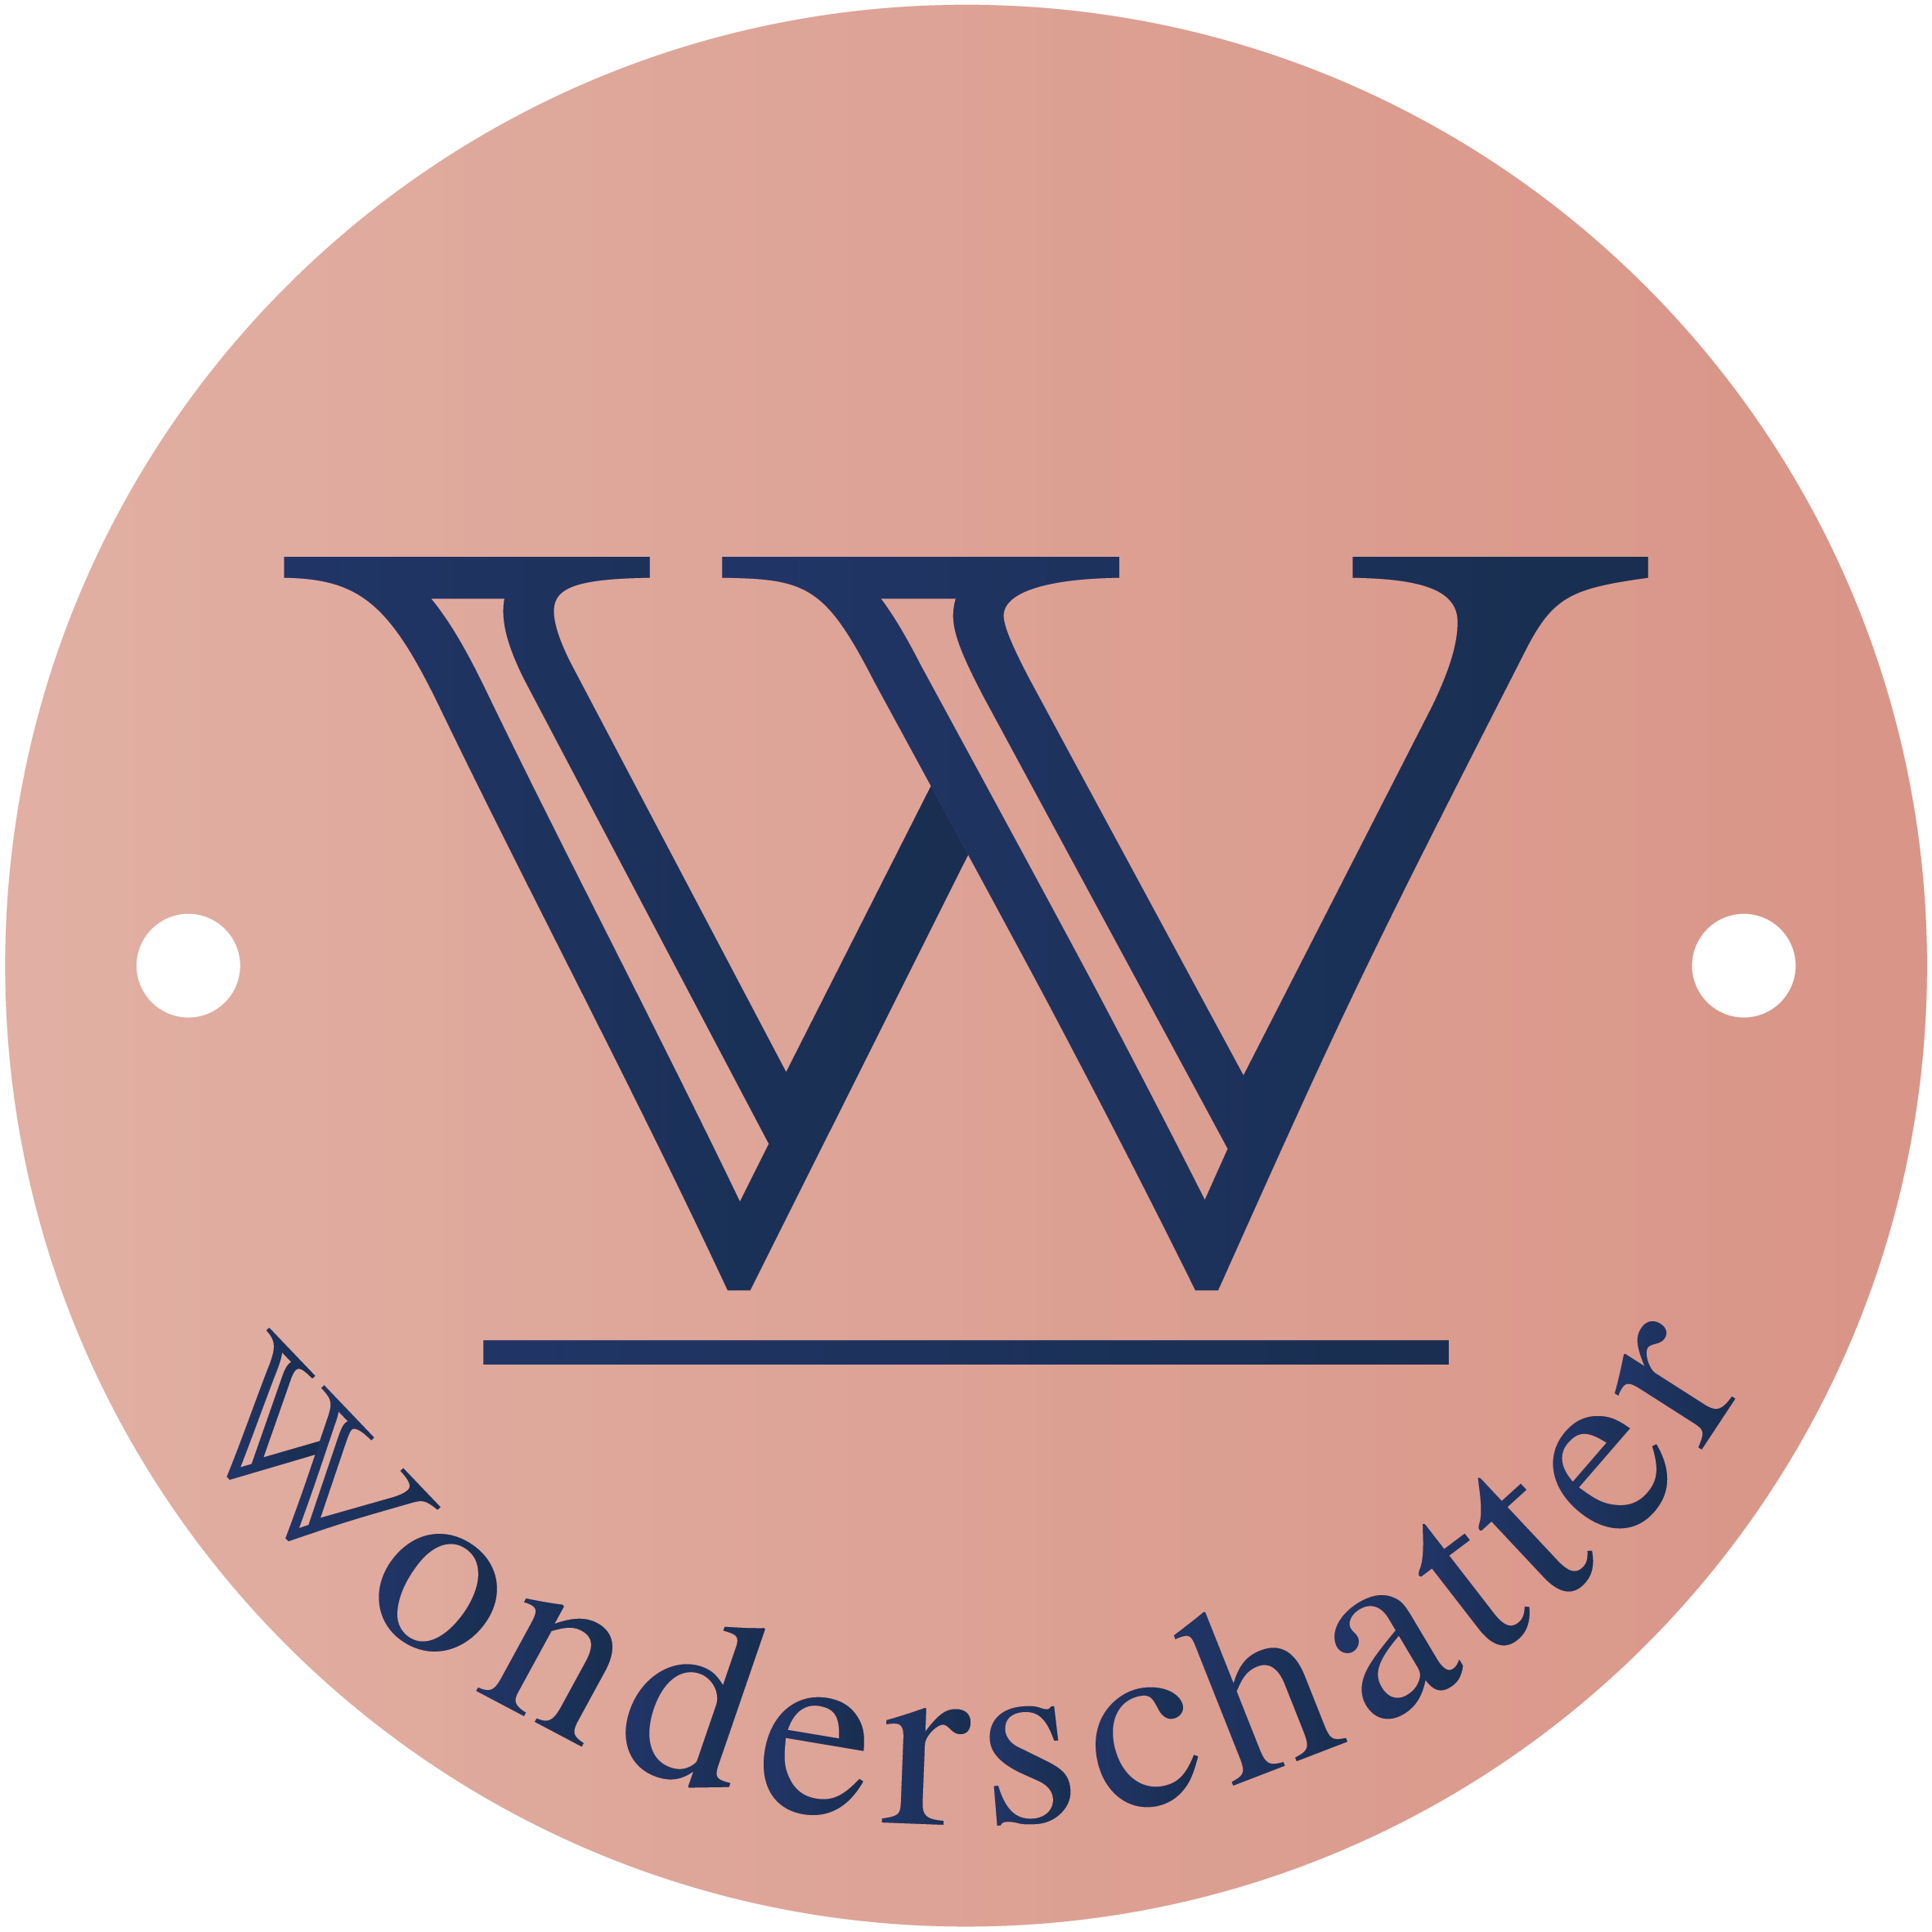 Wonderschatter Logo